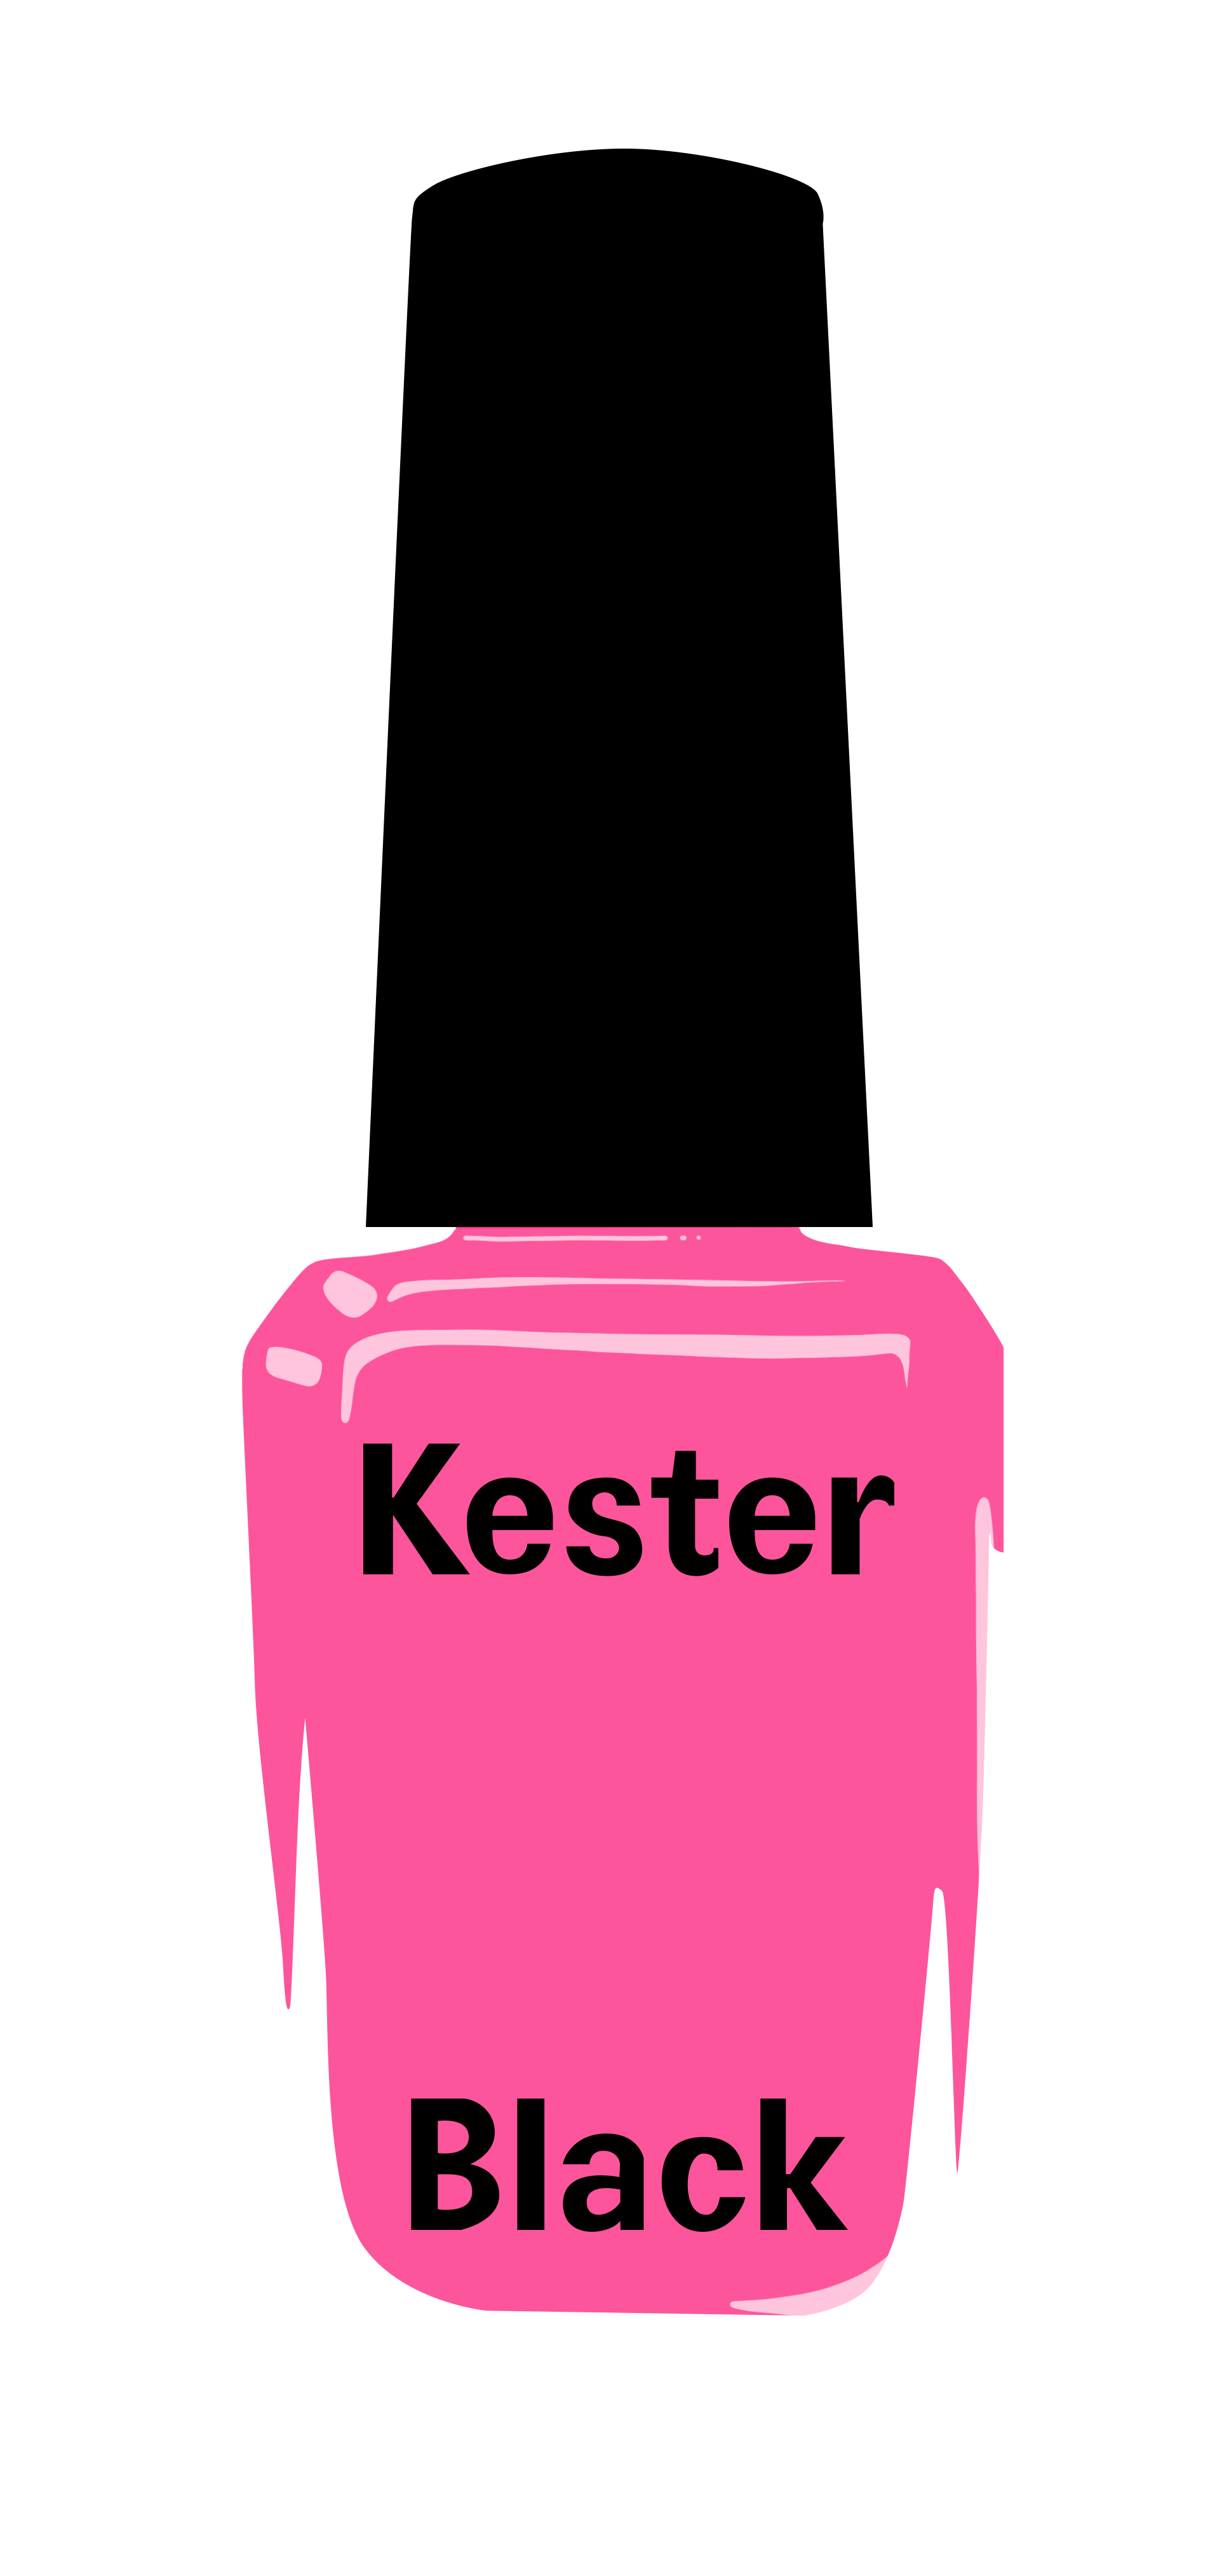 Kester_Blaack.png